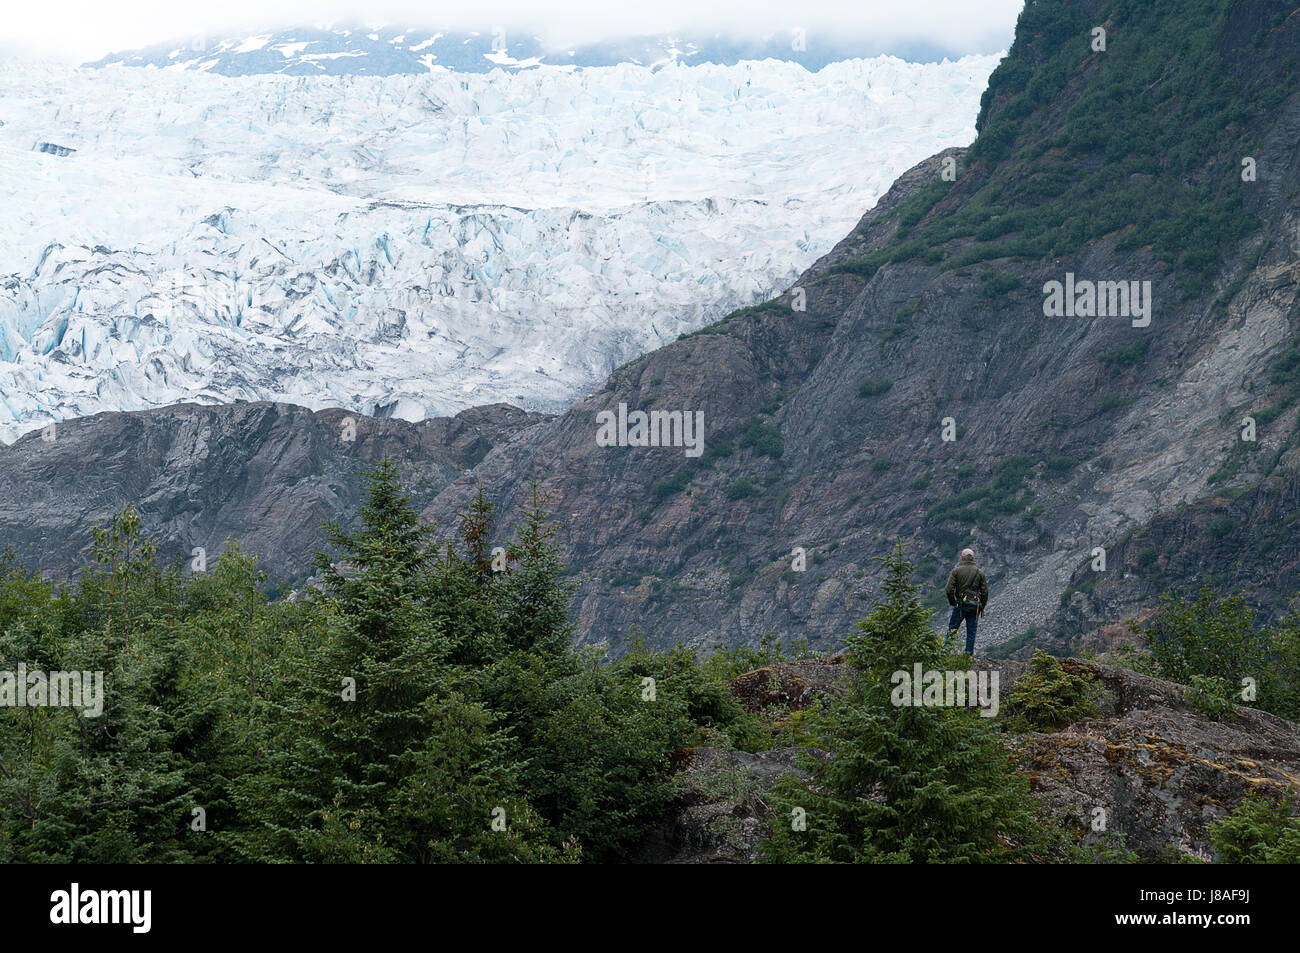 Mendenhall Glacier near Juneau Alaska - Stock Image